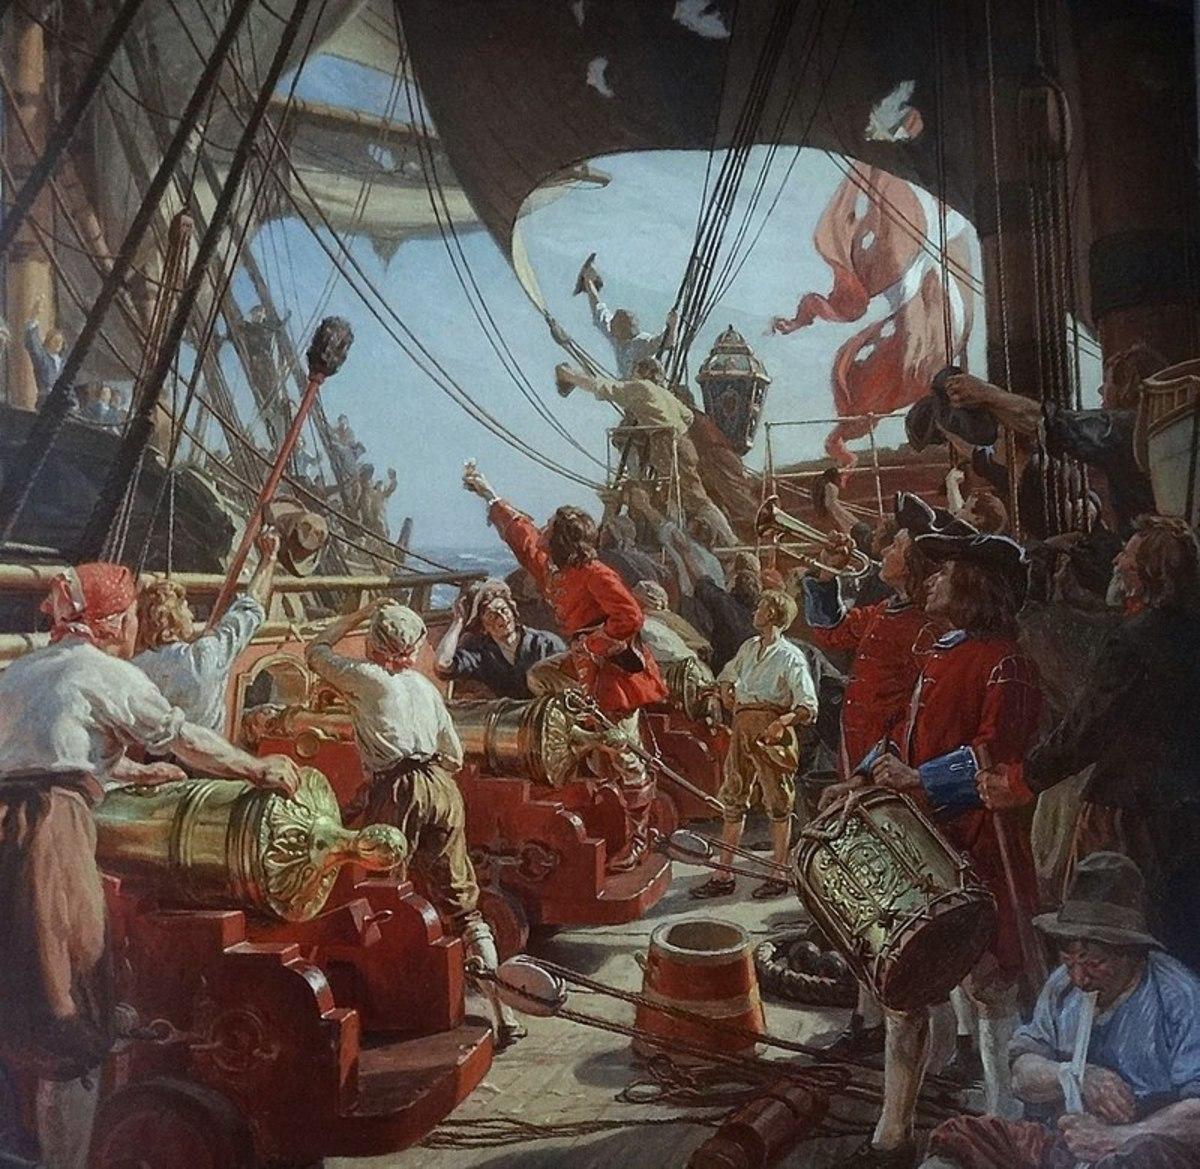 Queen Elizabeth's Pirates: Heroes or Villains?